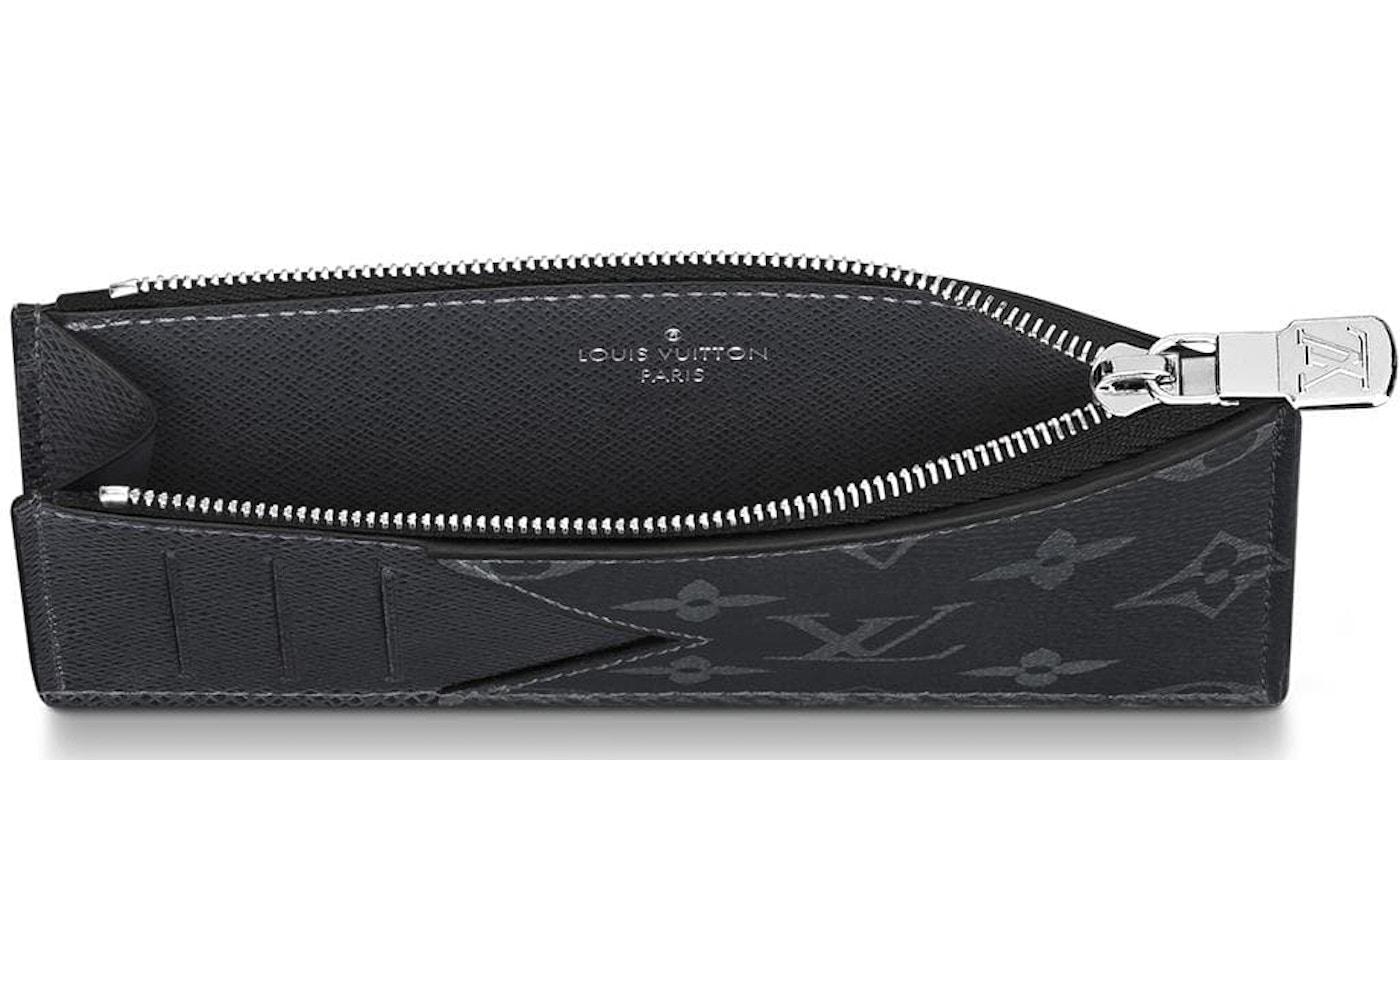 fe9edb24158e Buy   Sell Luxury Handbags